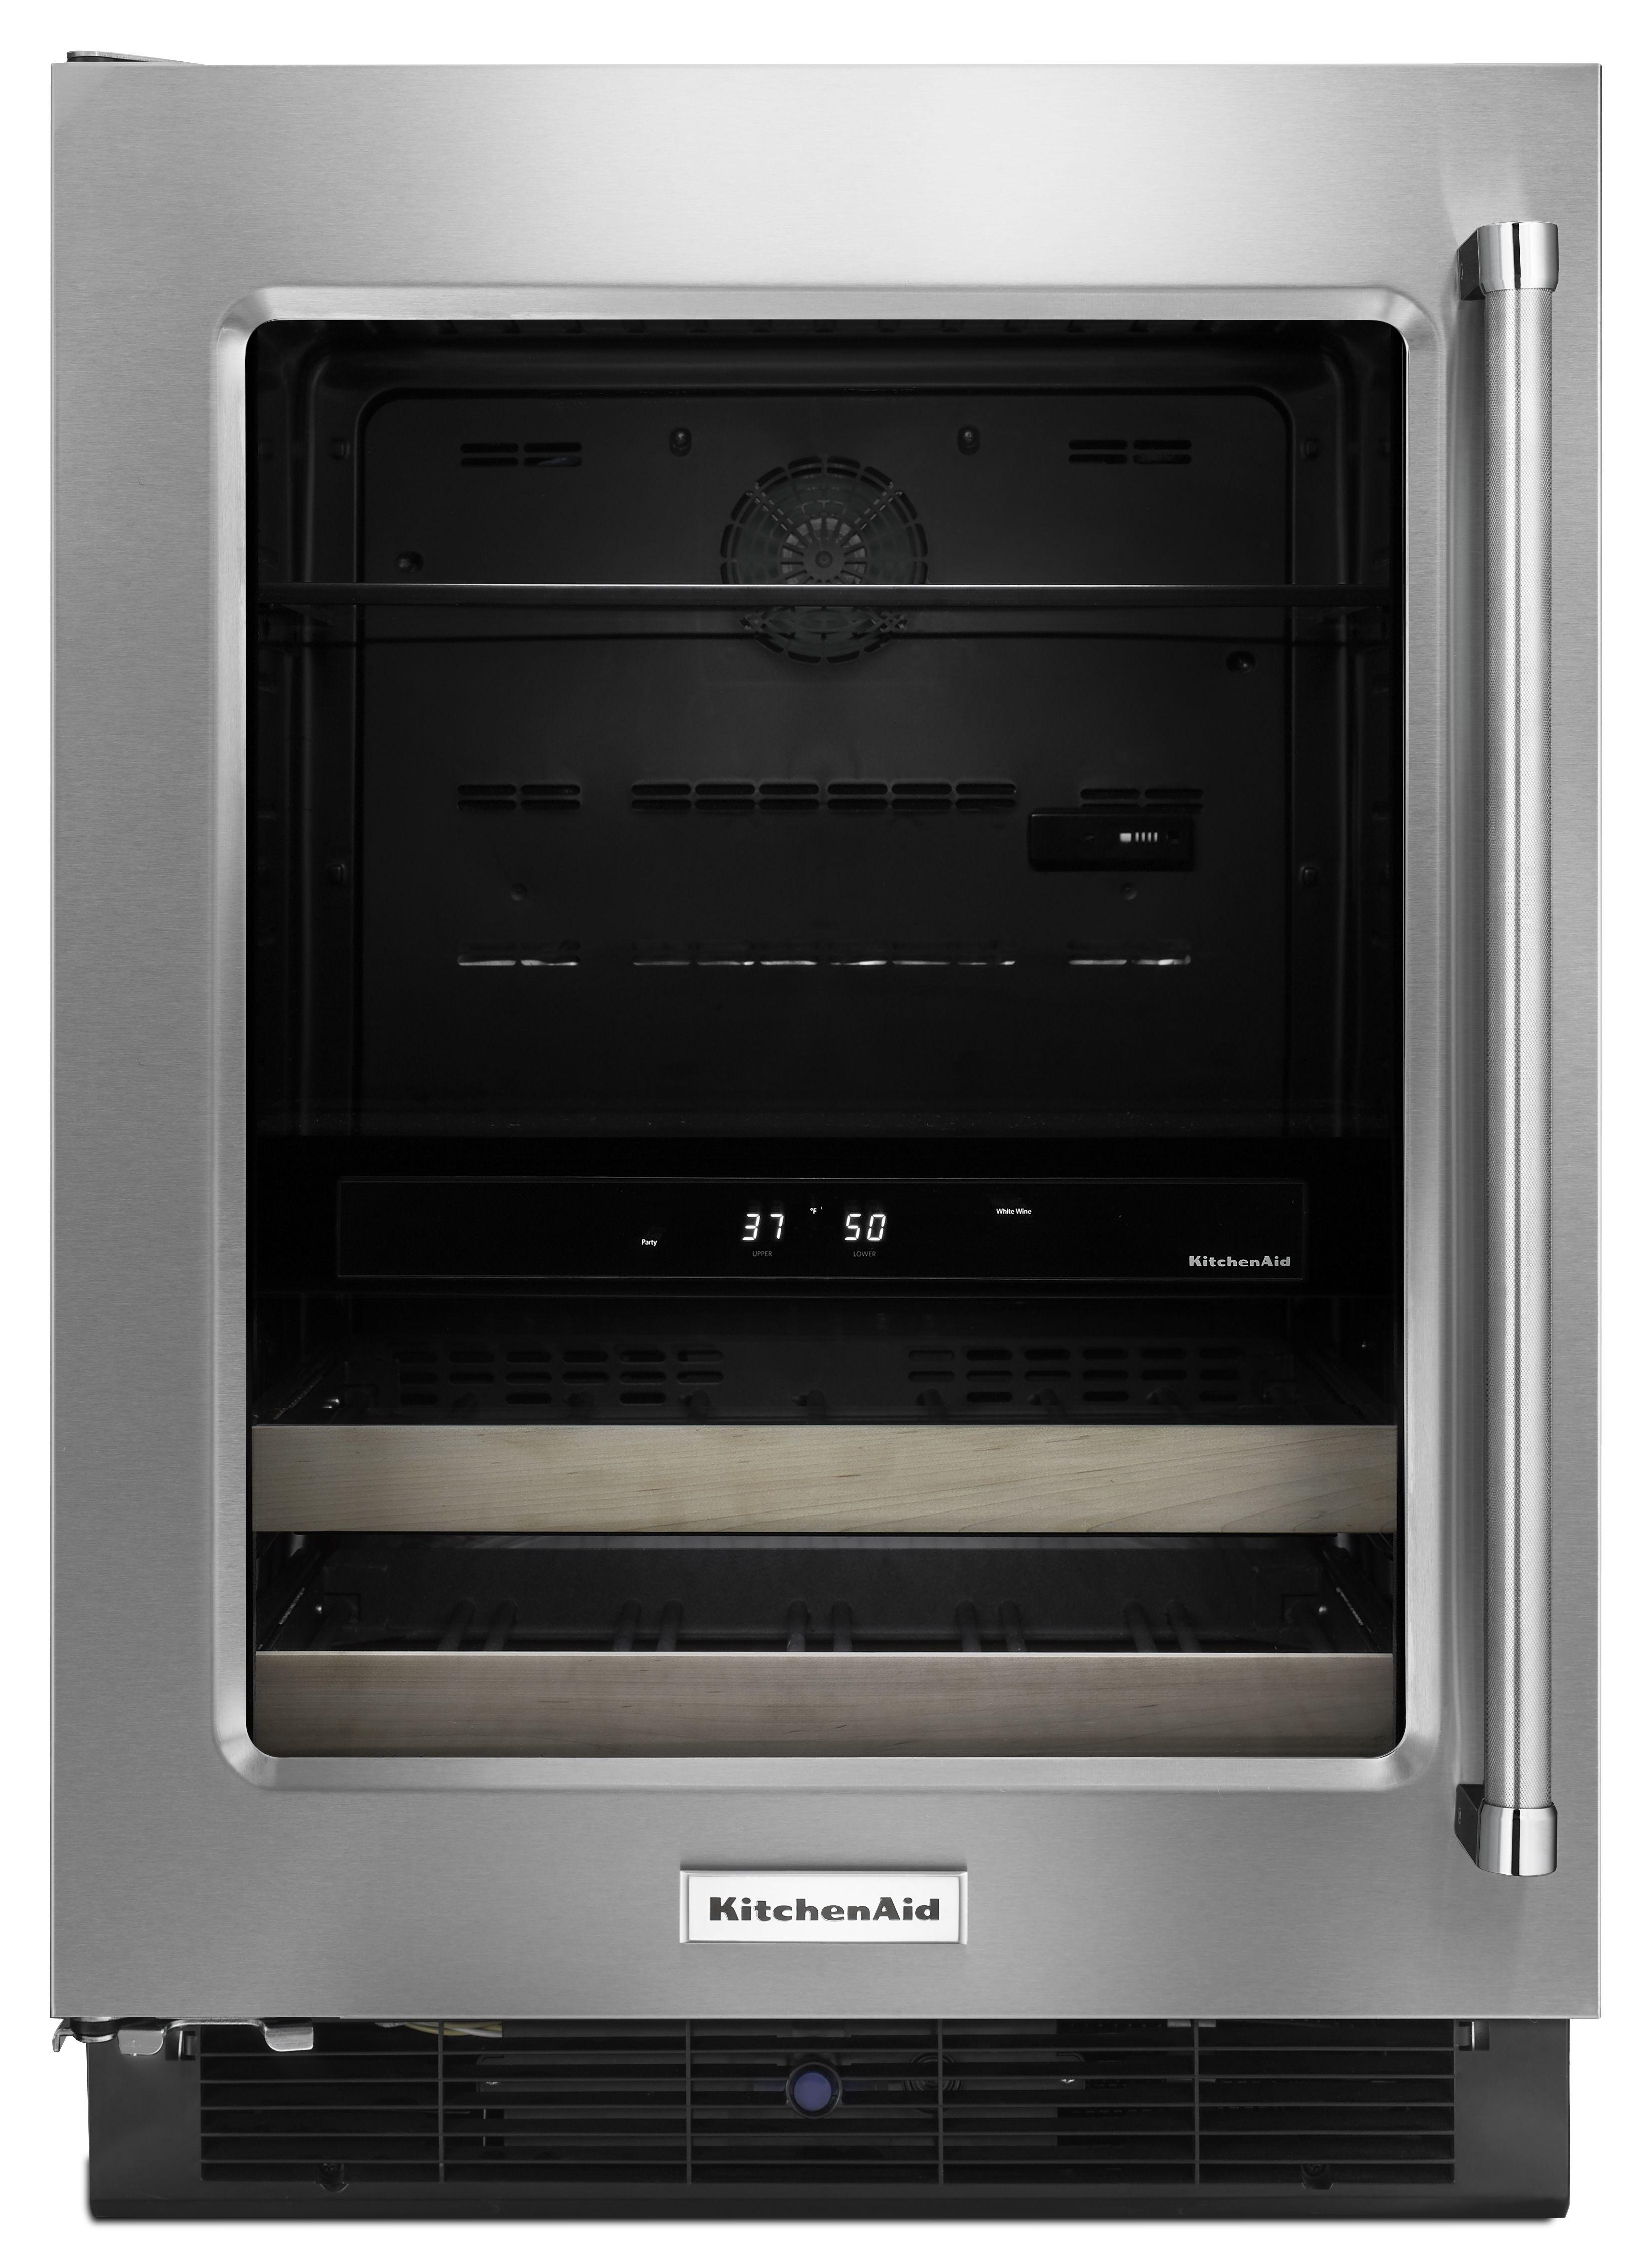 KitchenAid® 4.80 Cu. Ft. Beverage Center-KUBL204E Home Appliances on whirlpool refrigerator shelf, kenmore refrigerator shelf, frigidaire refrigerator shelf, samsung refrigerator shelf, amana refrigerator shelf,